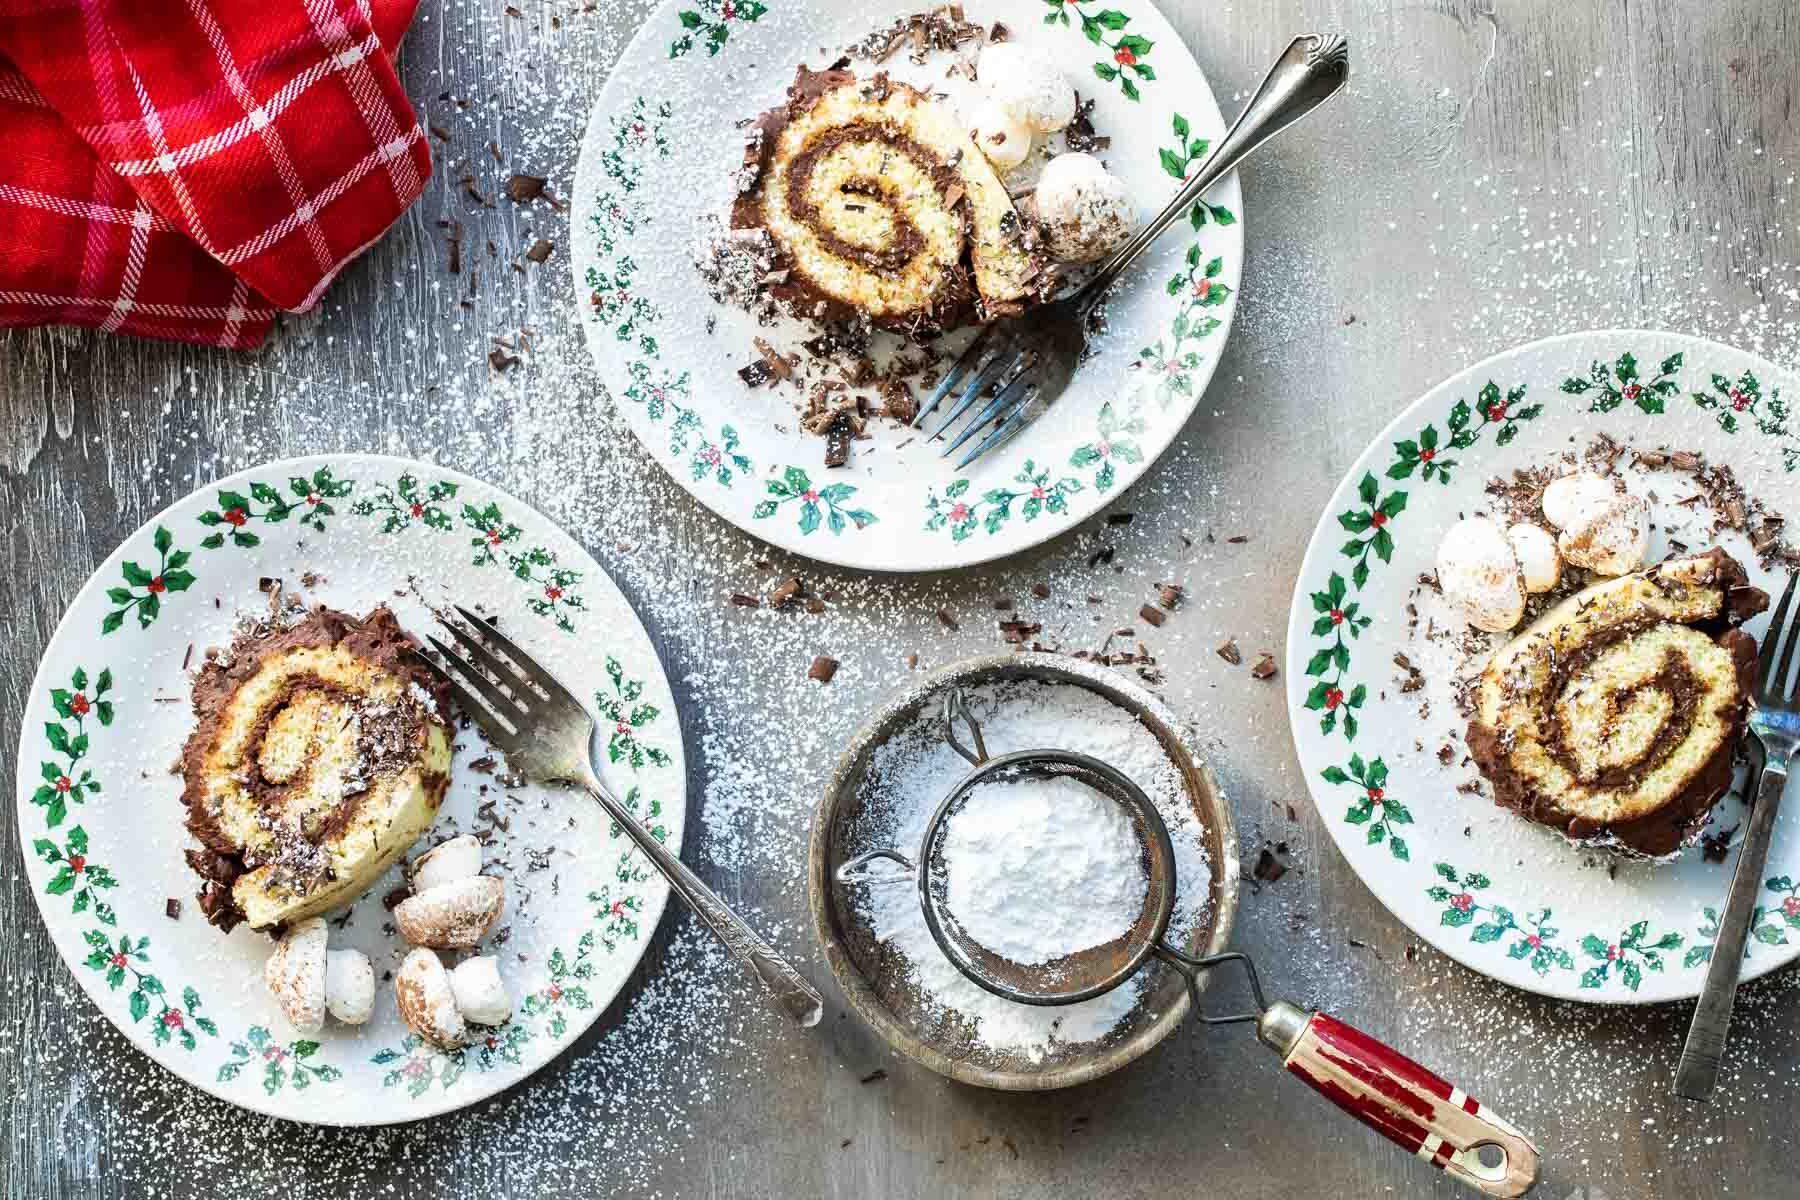 3 slices of Buche de Noel (yule log cake) on plates.